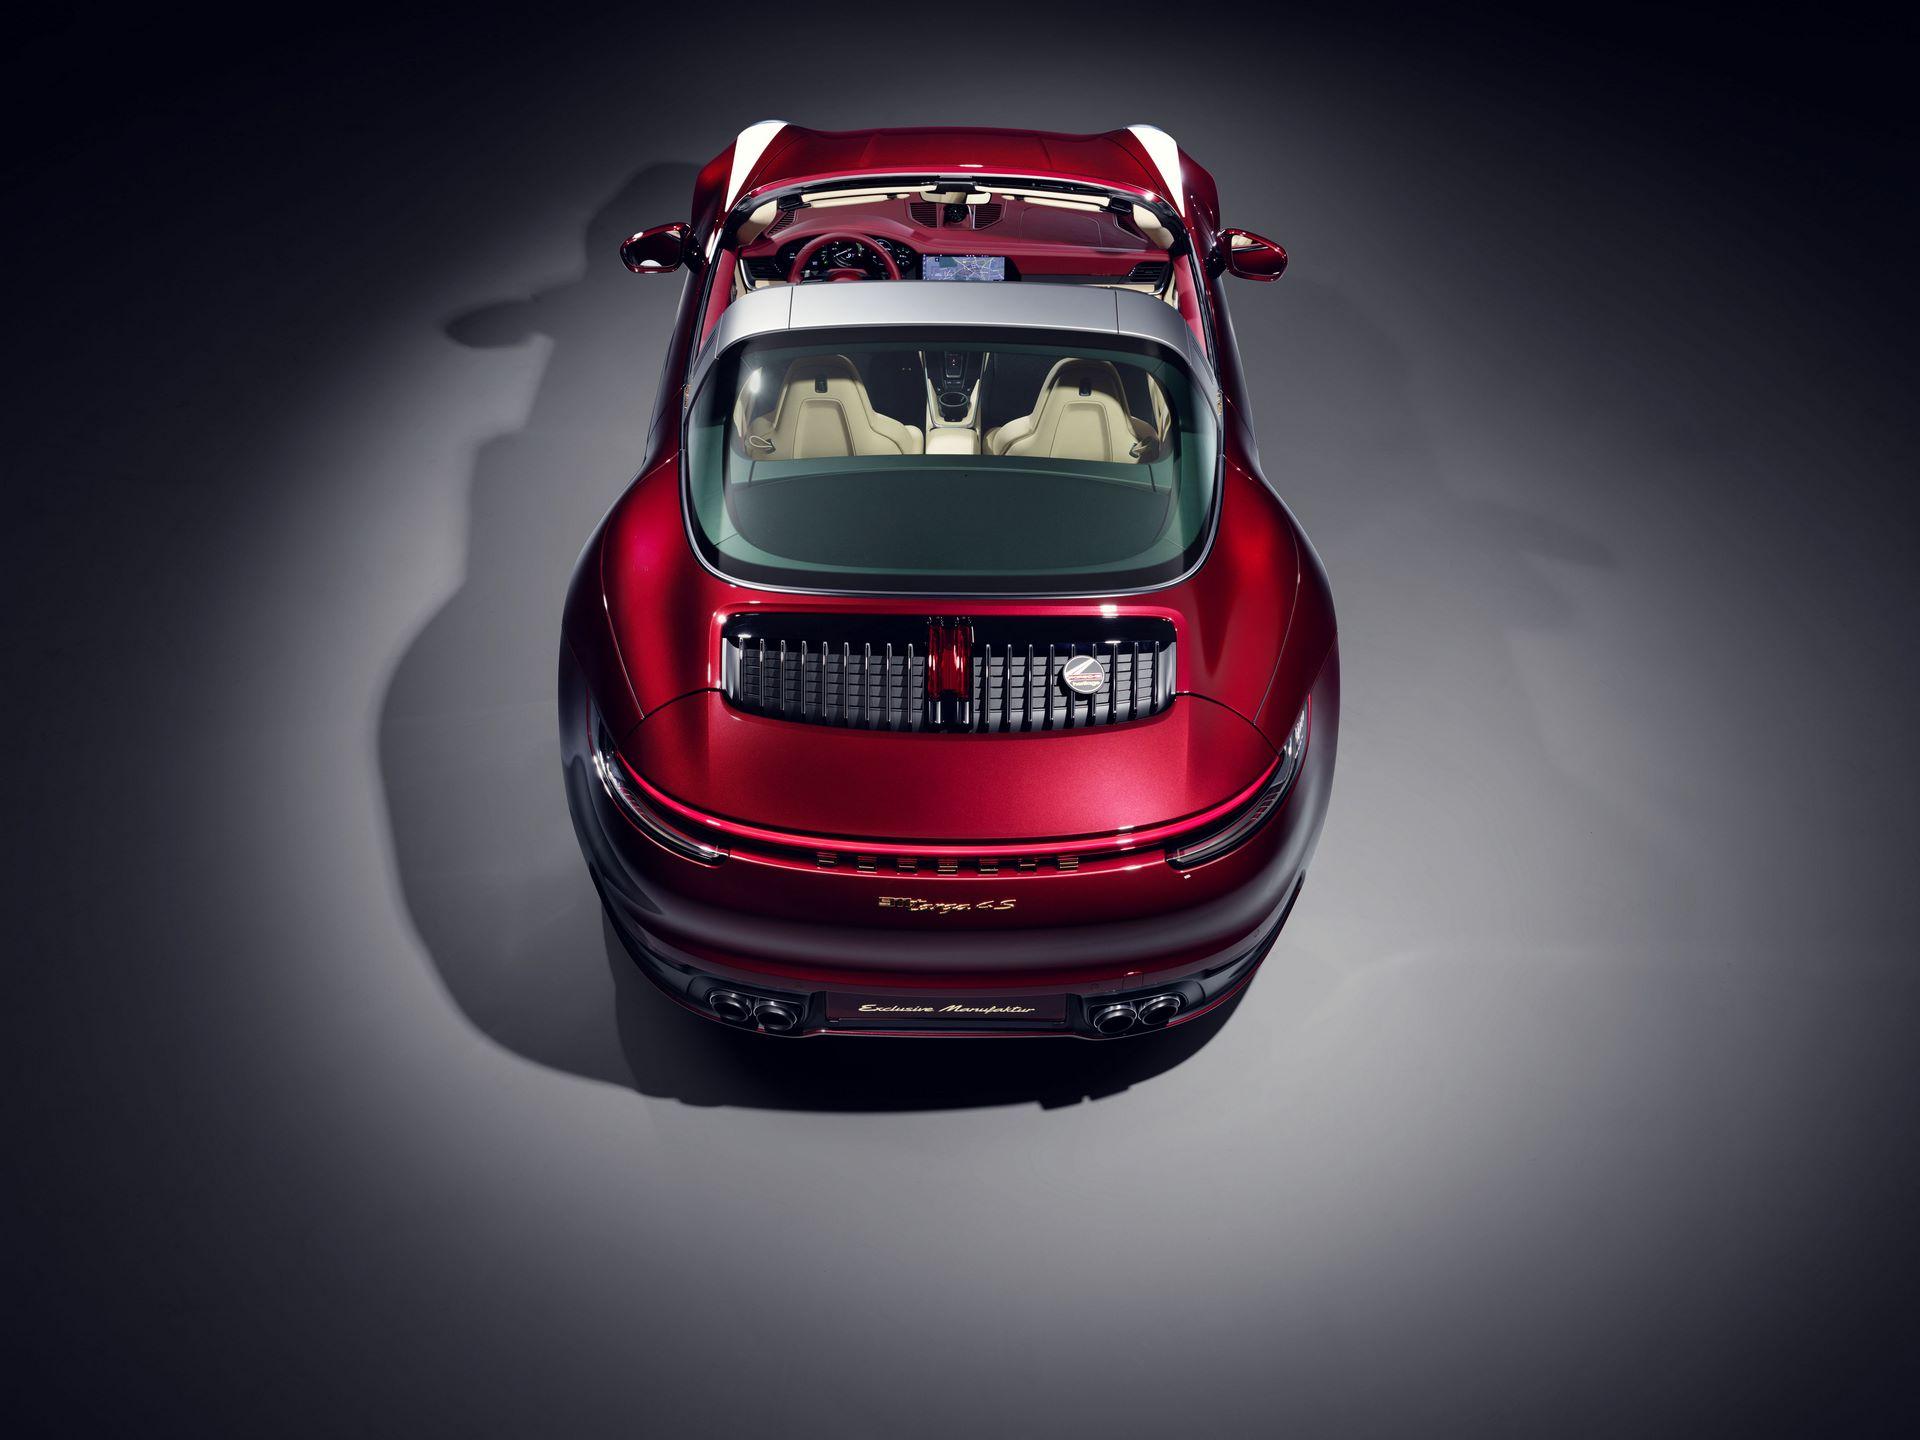 Porsche-911-Targa-4S-Heritage-Design-Edition-41